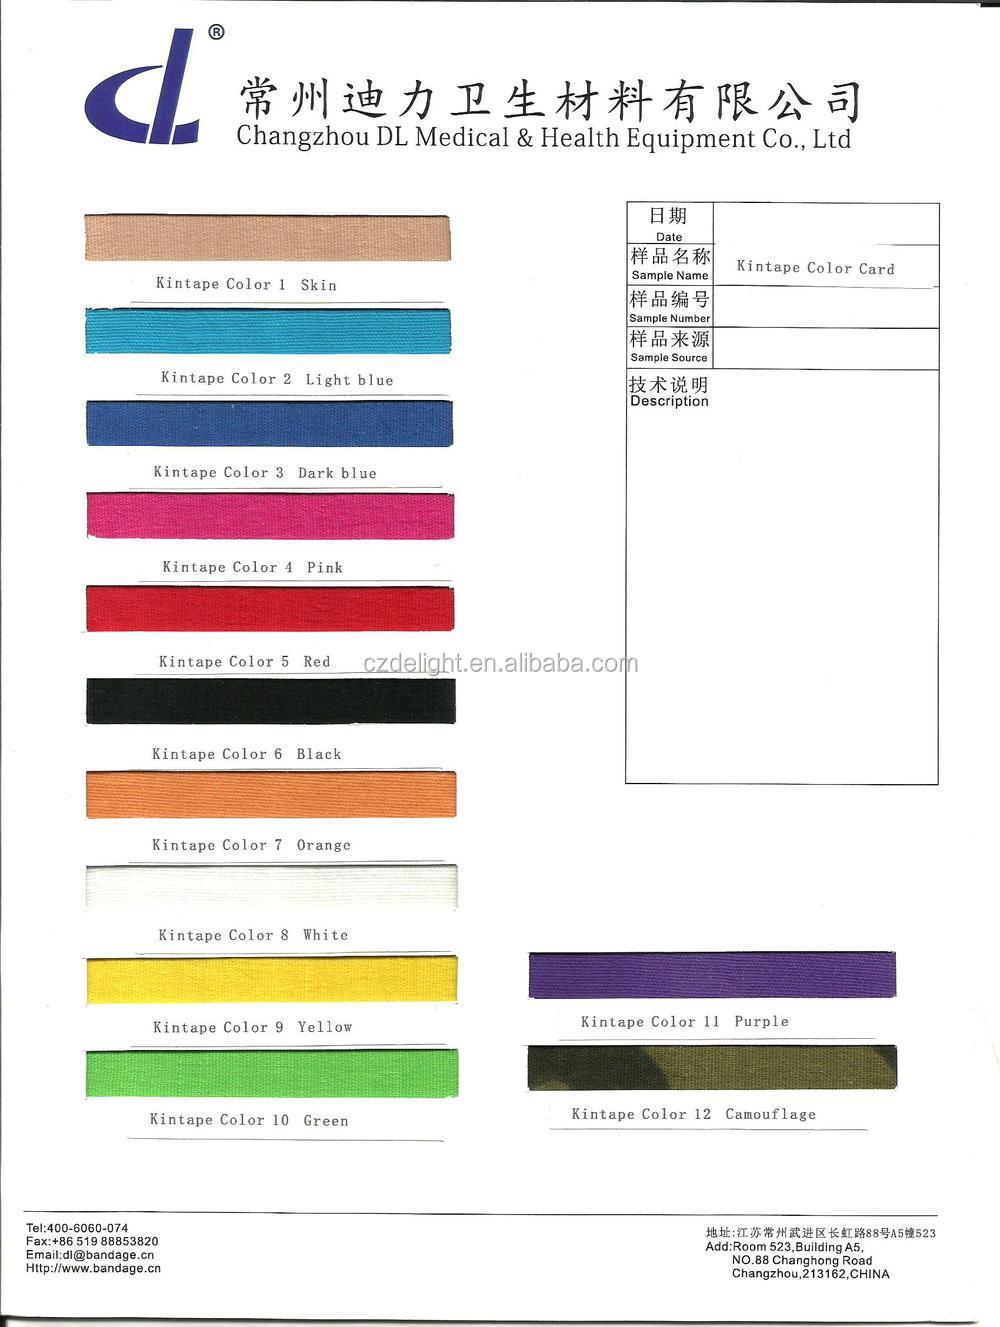 kintape colorful card (2)